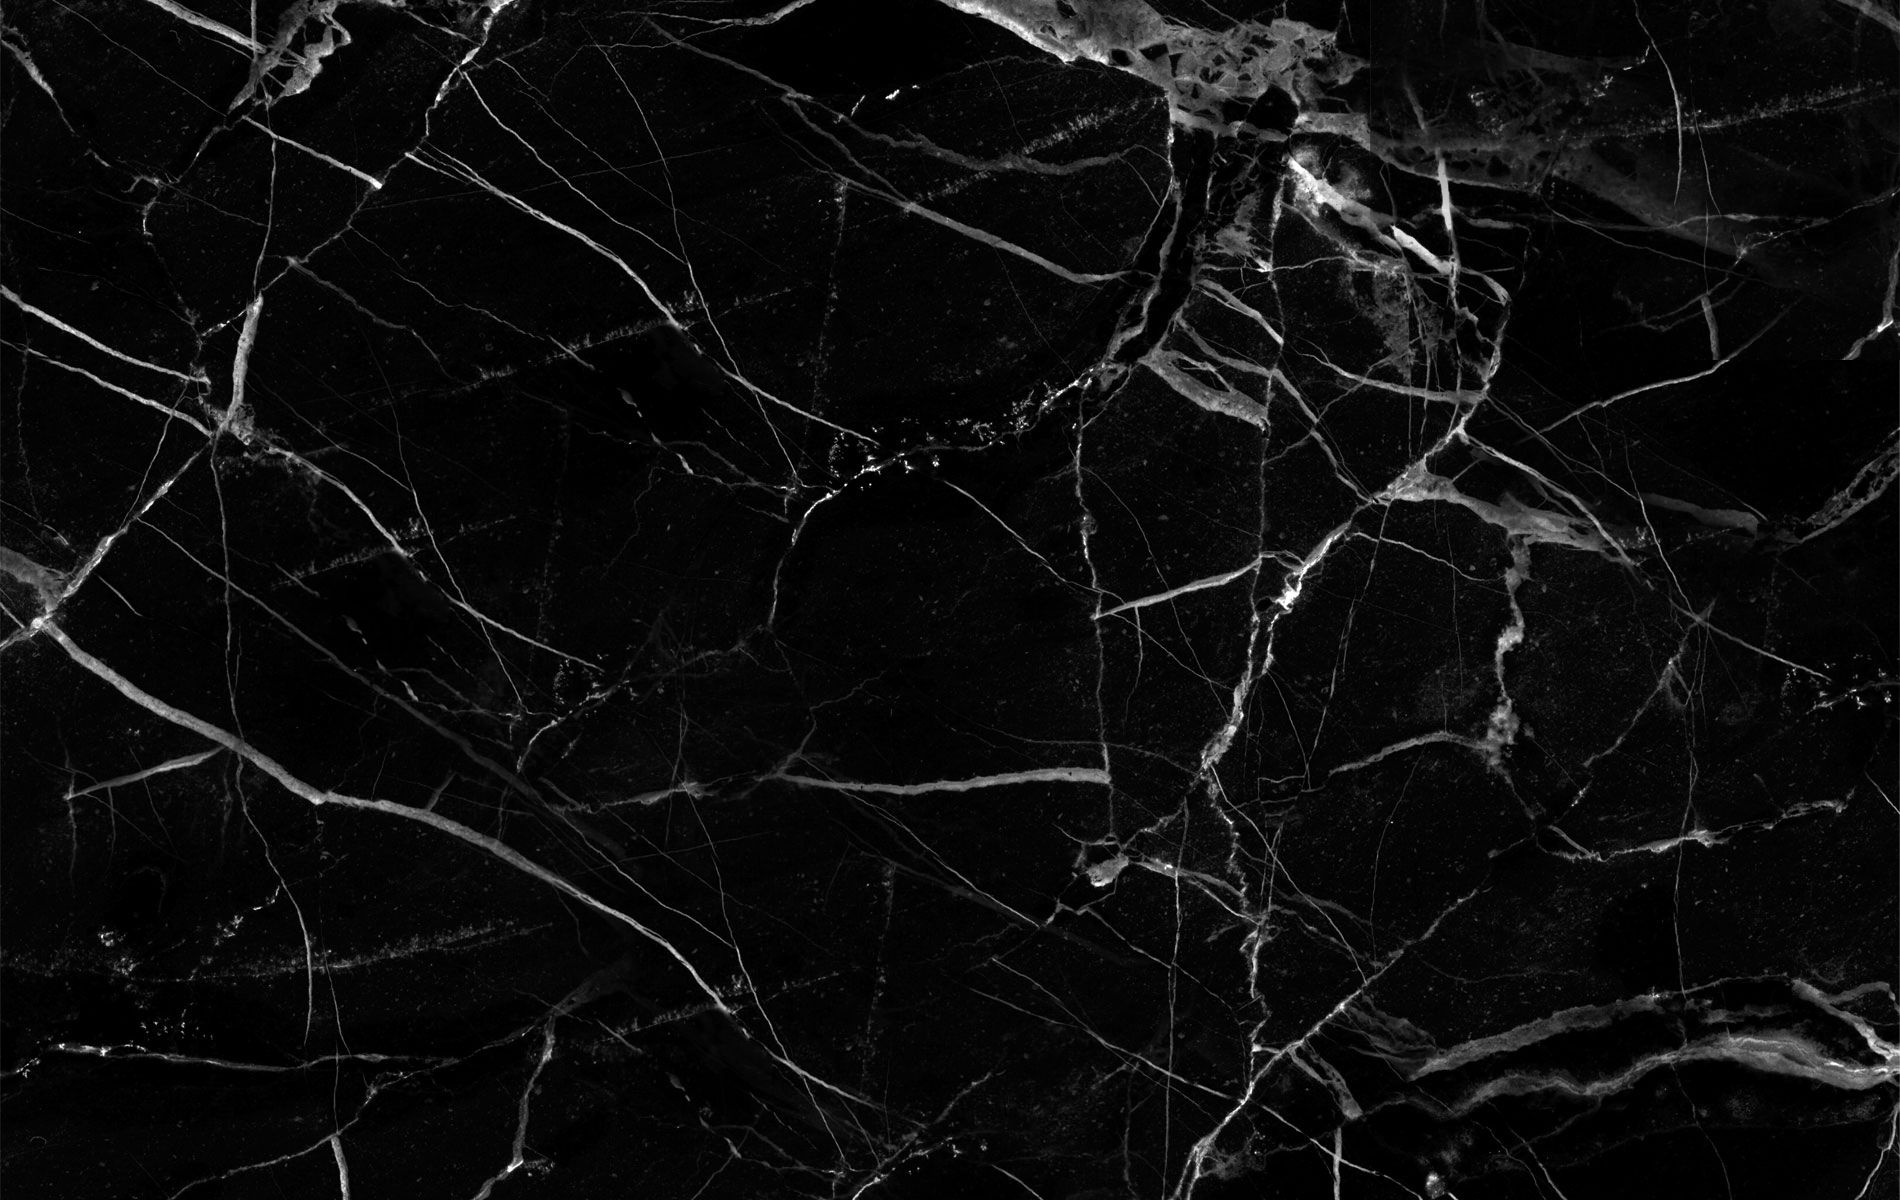 Dark Black Marble HD Photos in 2019 Desktop wallpaper